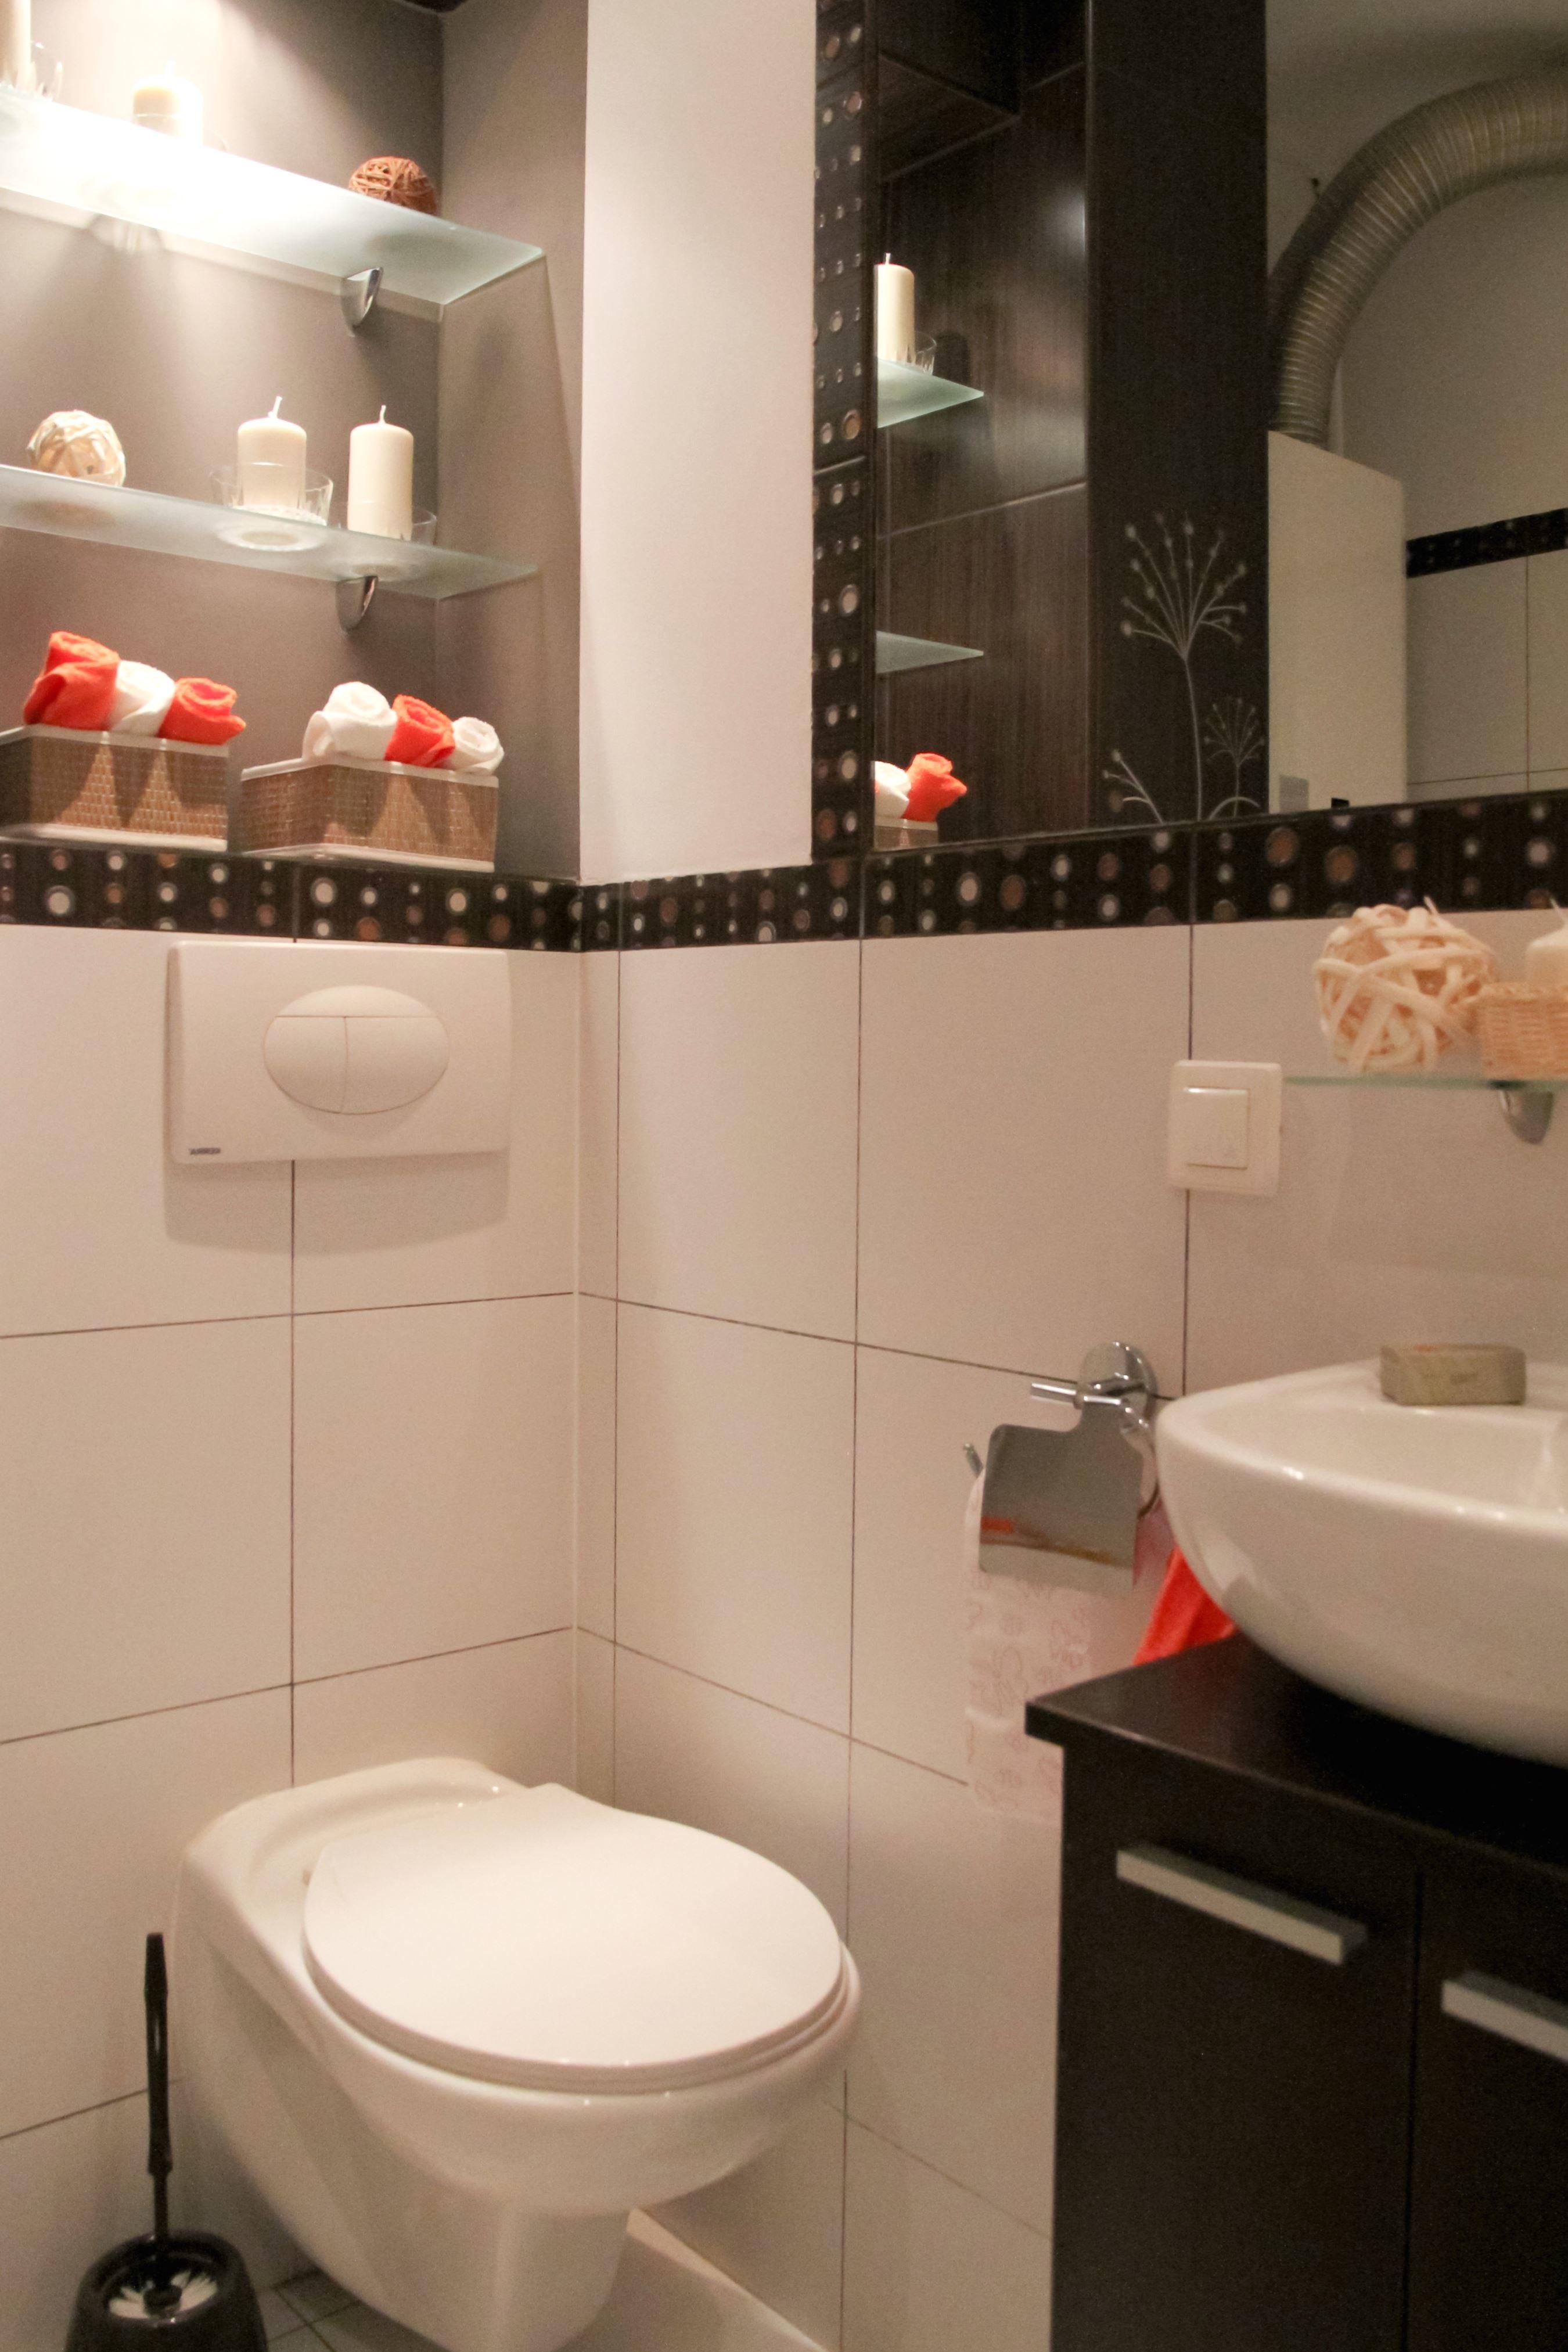 Salle De Bain Toilettes ~ image libre chambre salle de bain toilette int rieur maison meuble